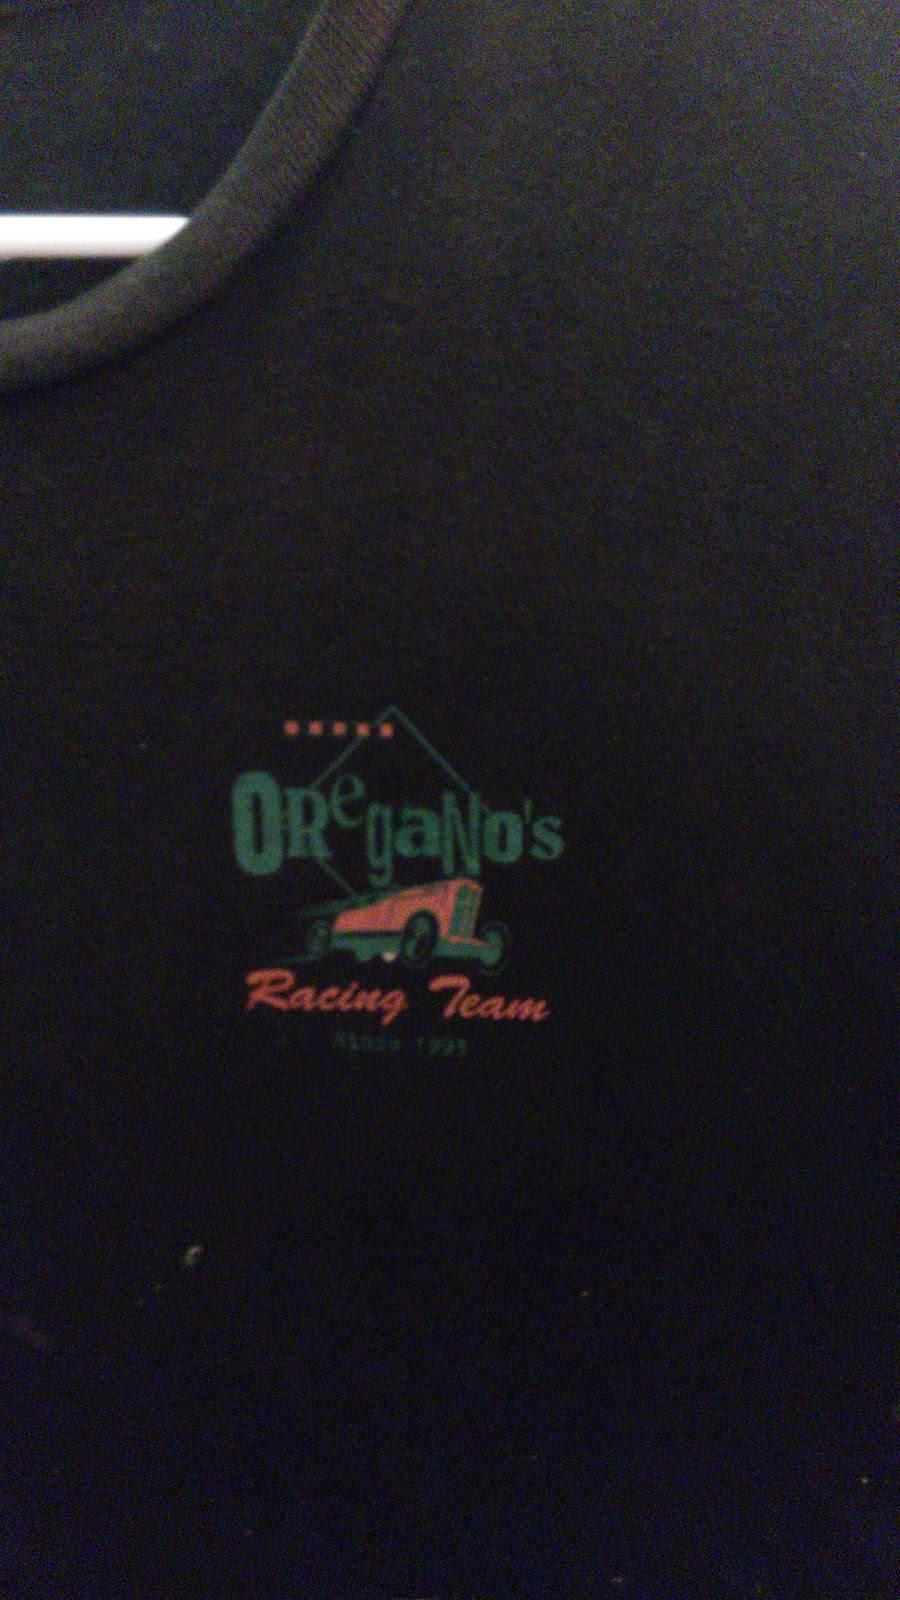 Arizona Custom T-Shirts - clothing store  | Photo 10 of 10 | Address: 5721 S Siesta Ln, Tempe, AZ 85283, USA | Phone: (480) 839-6244